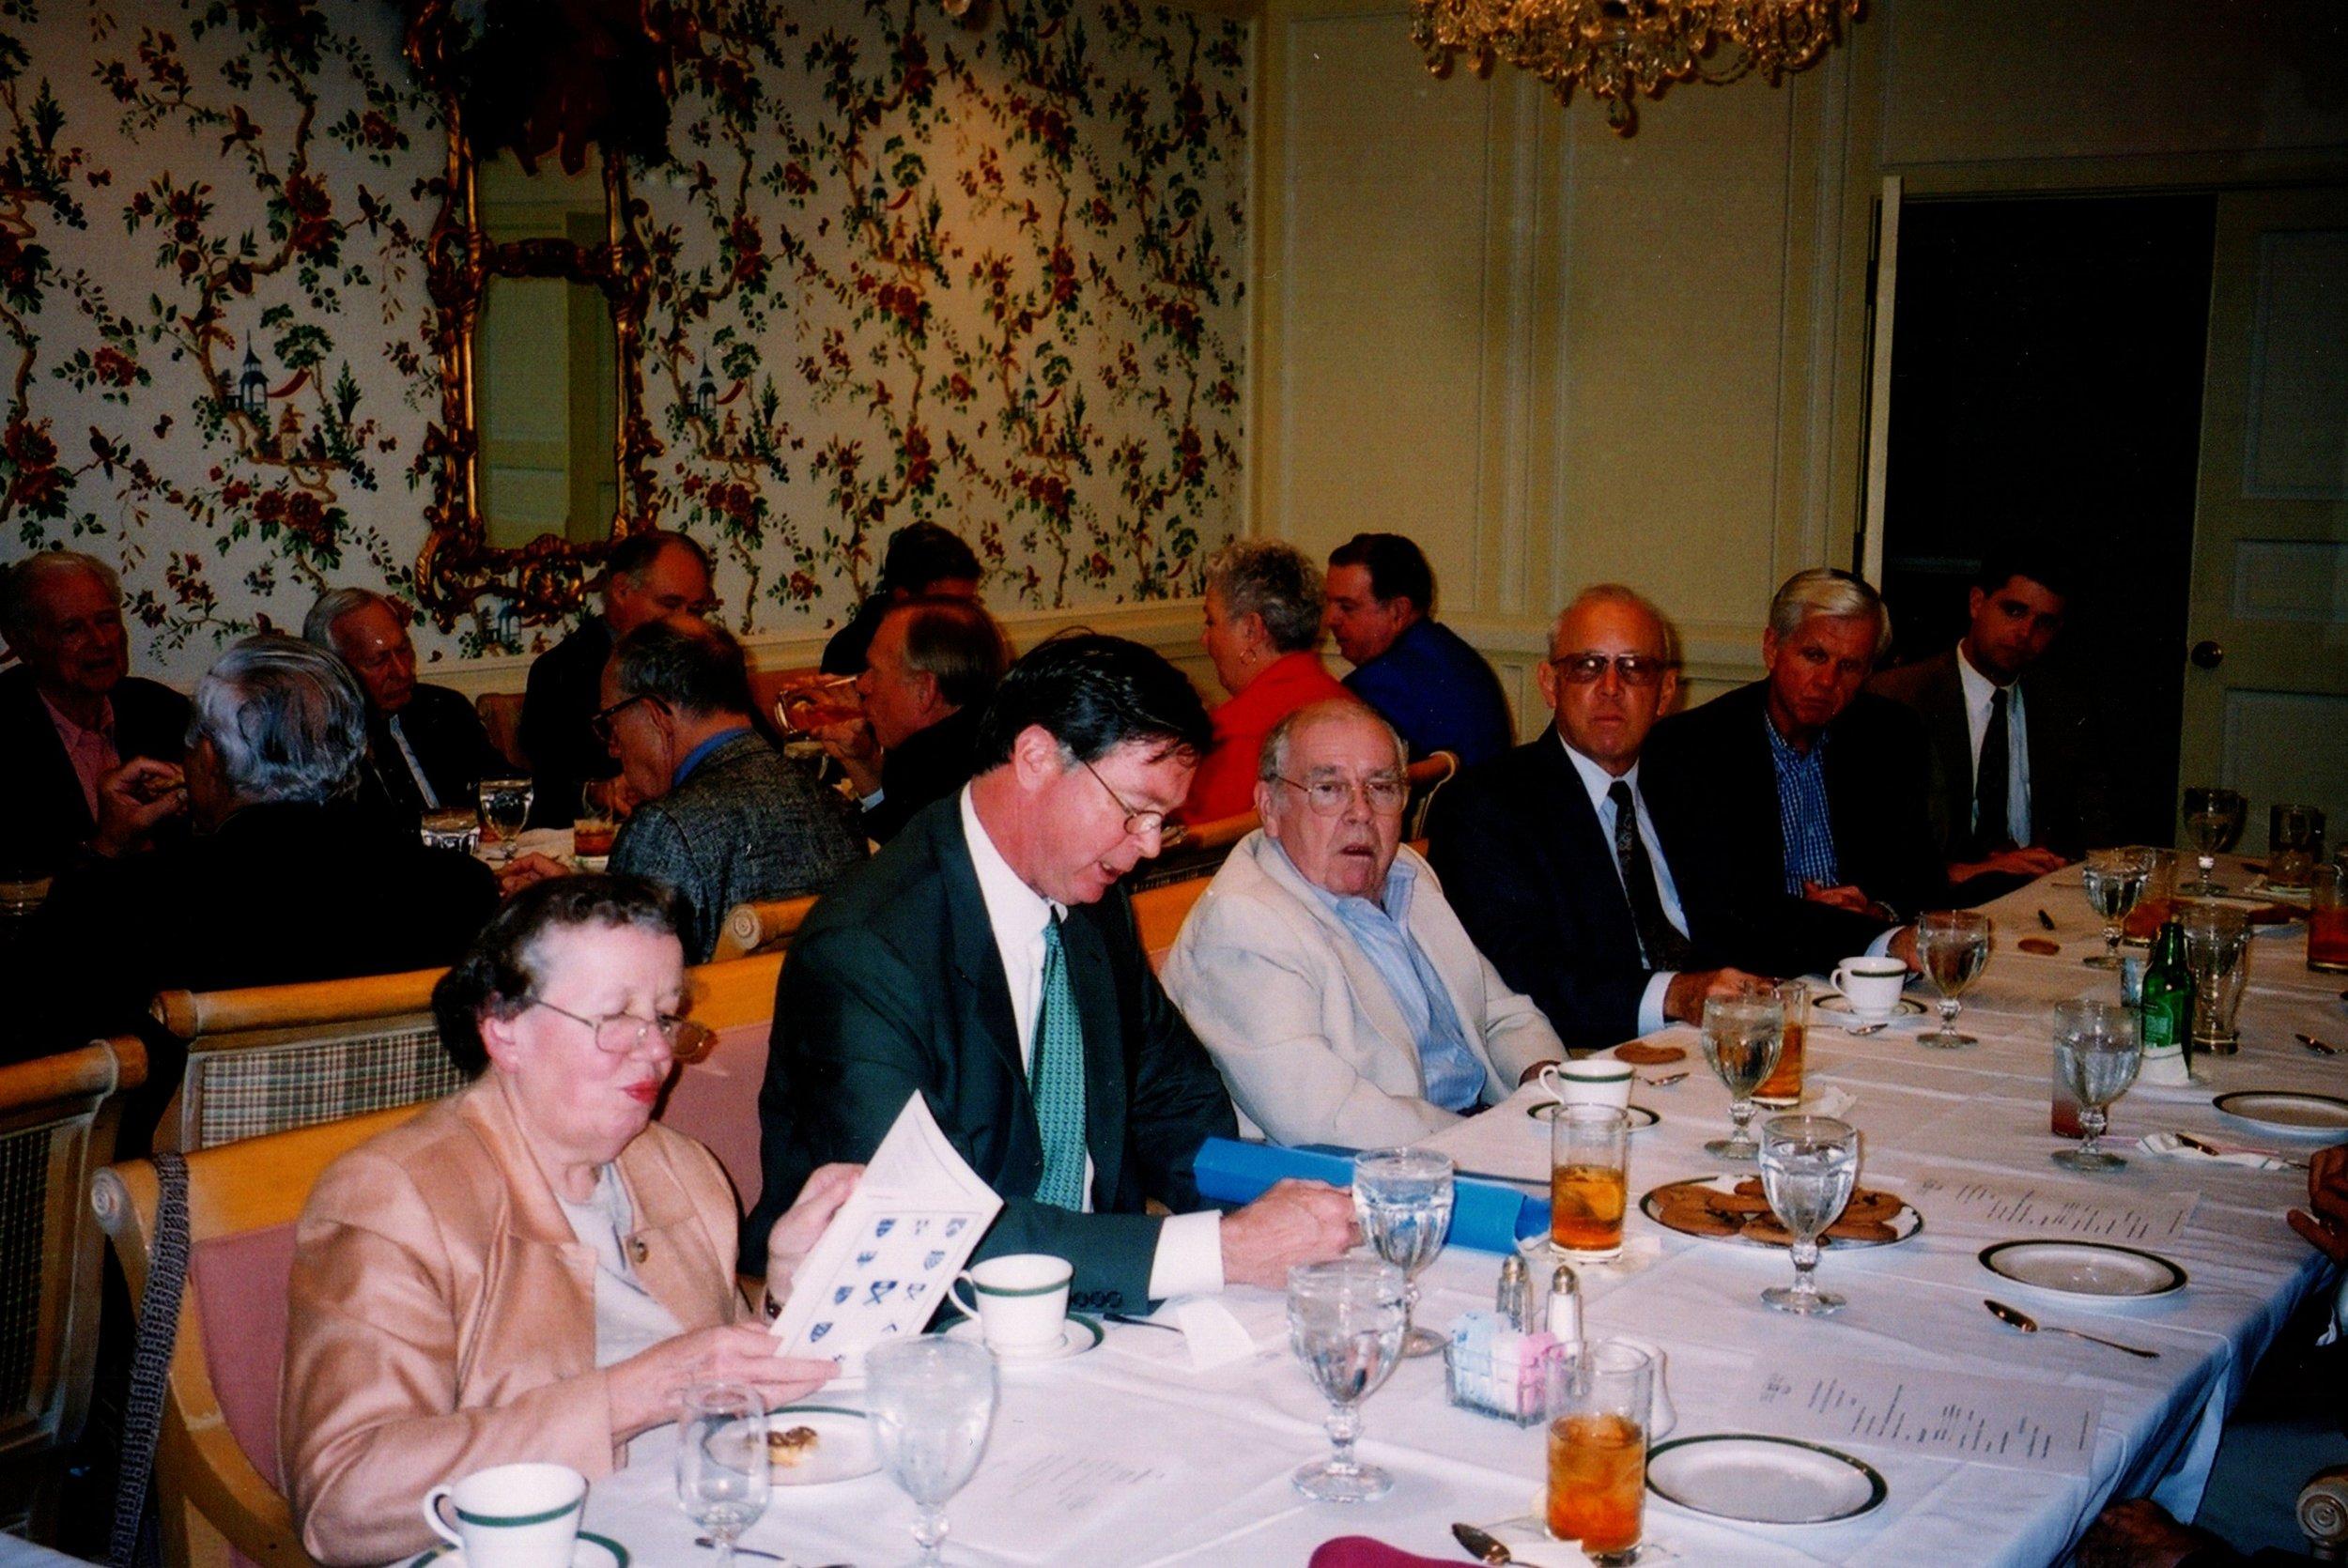 1_15_2000 - ANNUAL MEETING OF MEMBERS - ROYAL POINCIANA GOLF CLUB7.jpg